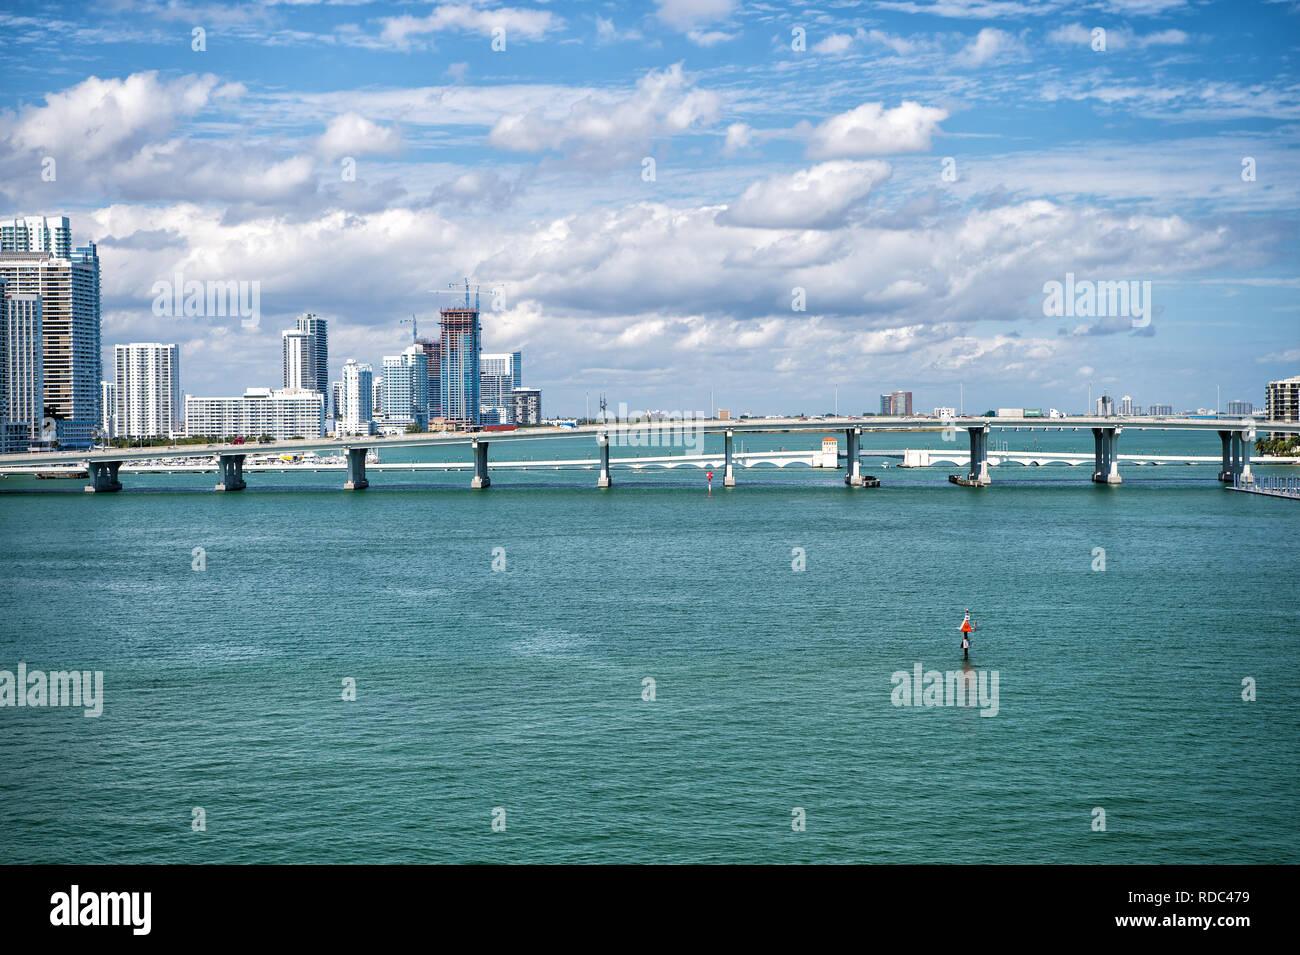 Miami, USA - 29 FEB 2016: Bridge over the Atlantic ocean in the middle of the sea. miami skyscrapers in coastline of usa with Venetian Causeway crosses Biscayne Bay. travel to usa, miami - Stock Image